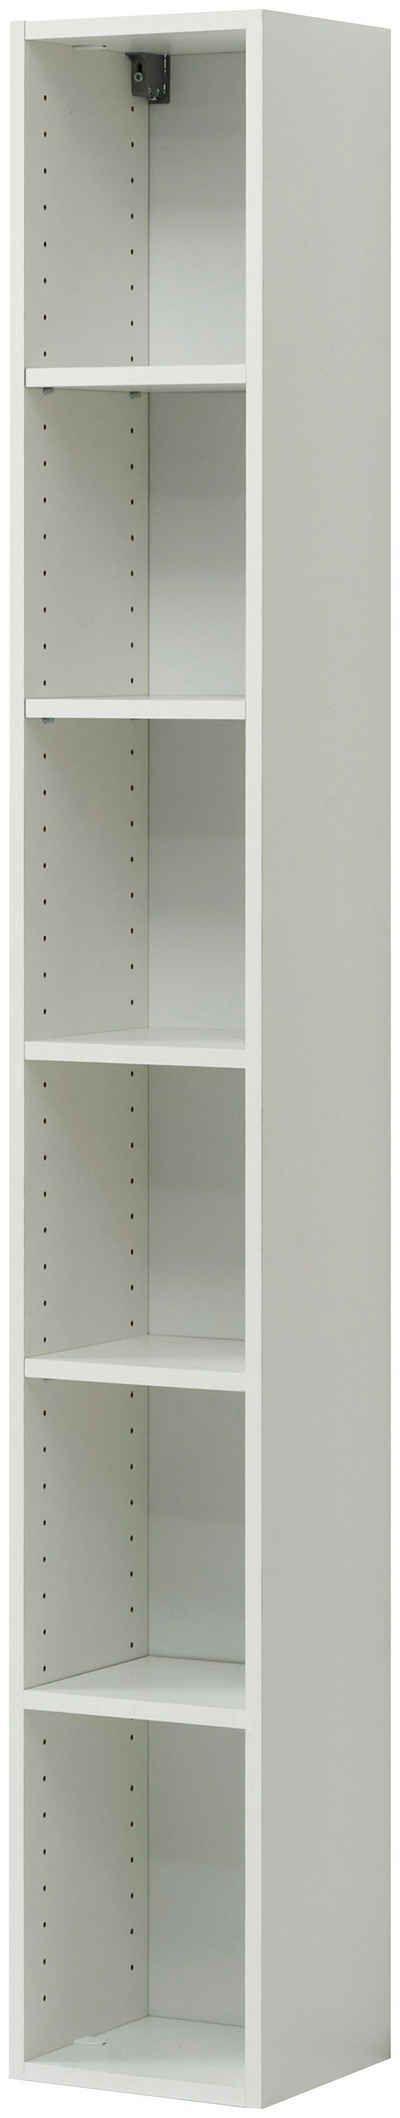 15 Realistisch Regal 25 Tief Schrank 25 Cm Tief Cheap Good Fabulous Schne Ideen In 2020 Bookcase Shelves Home Decor